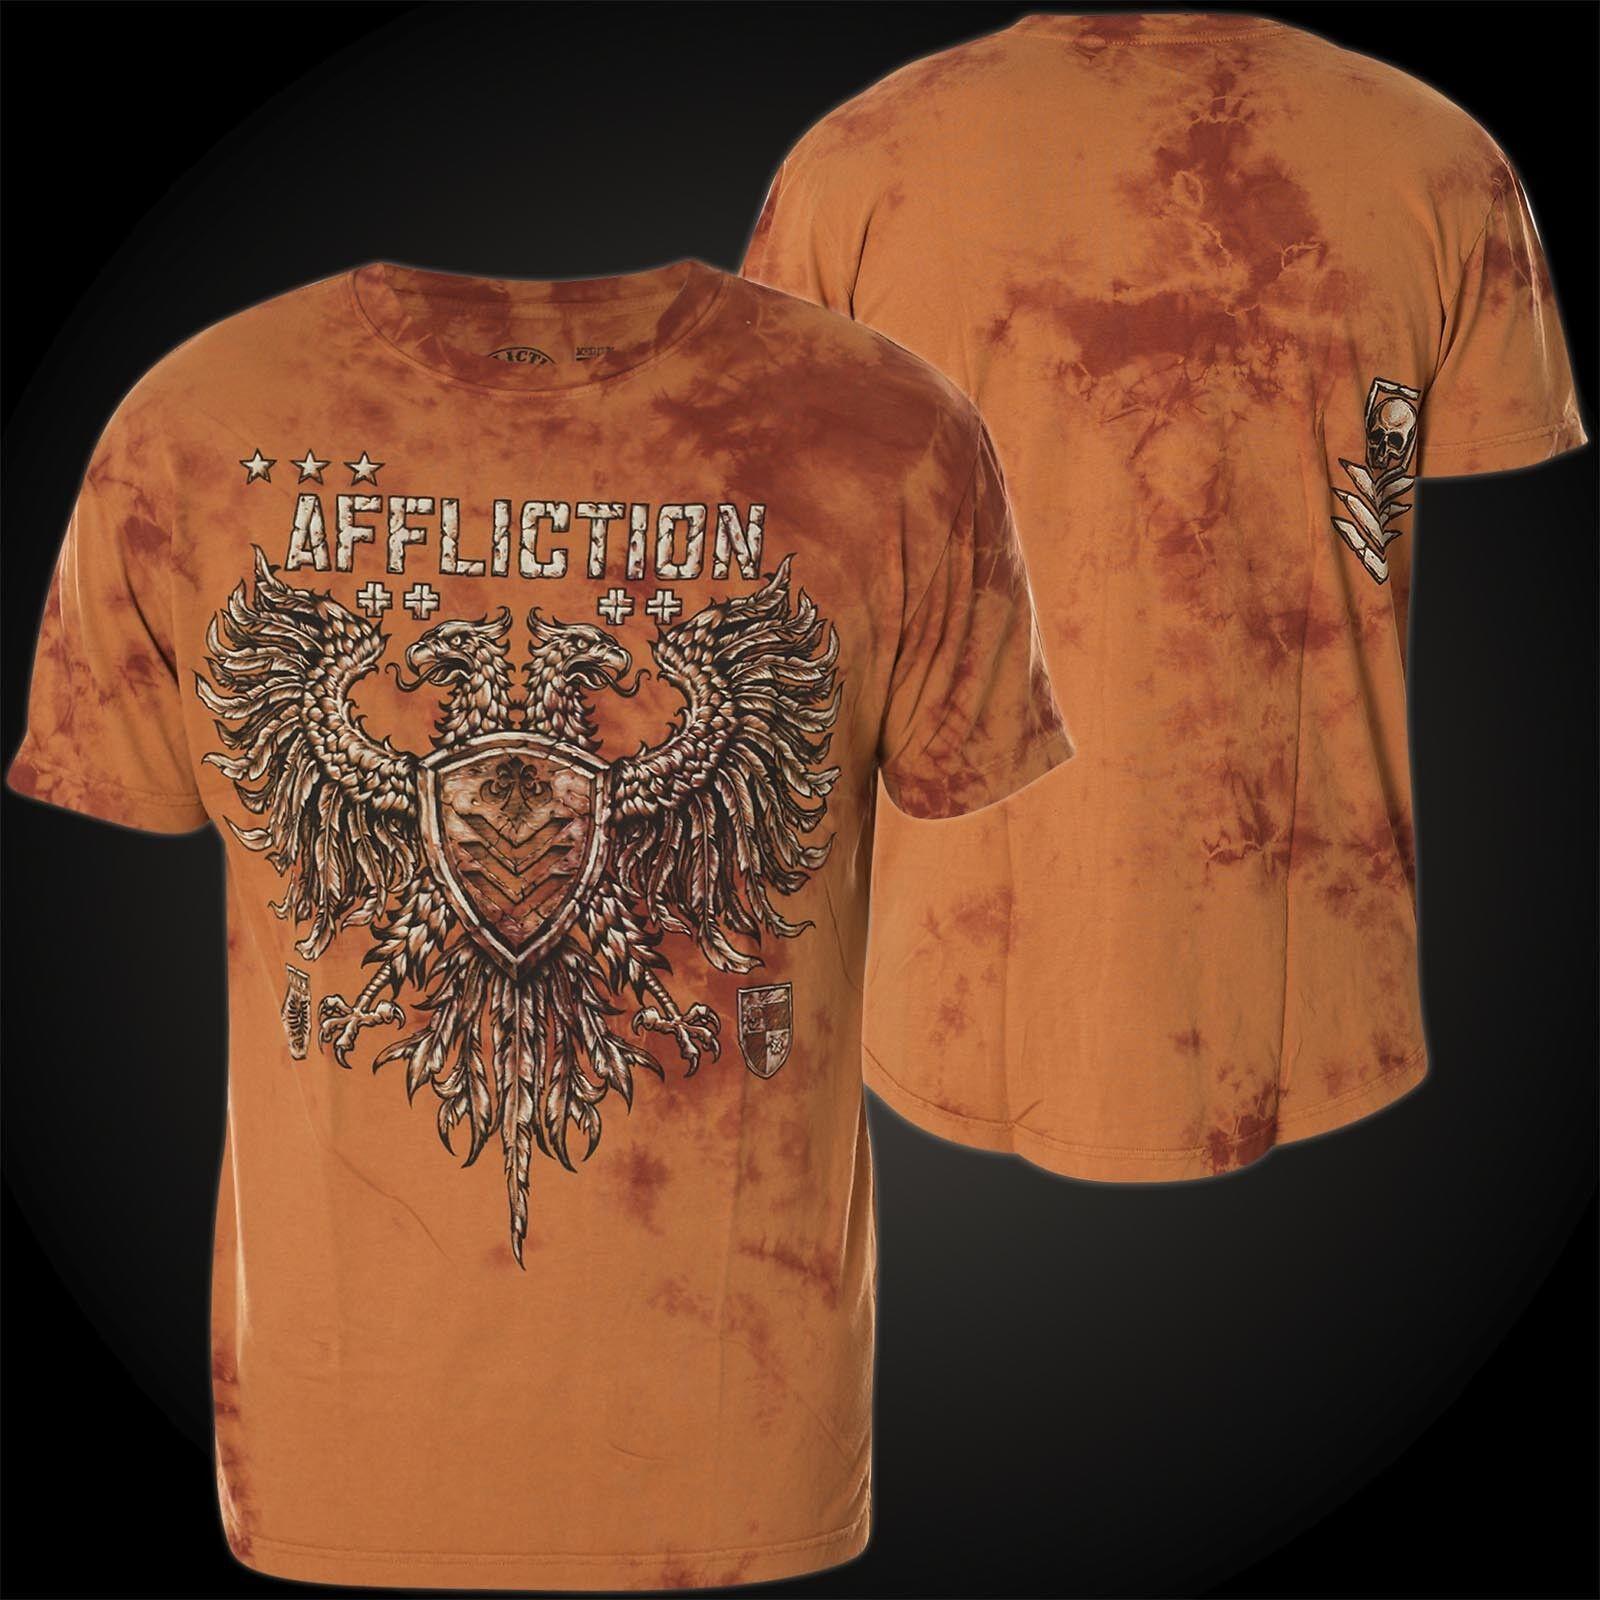 AFFLICTION T-Shirt Value Chalkboard Orange T-Shirts